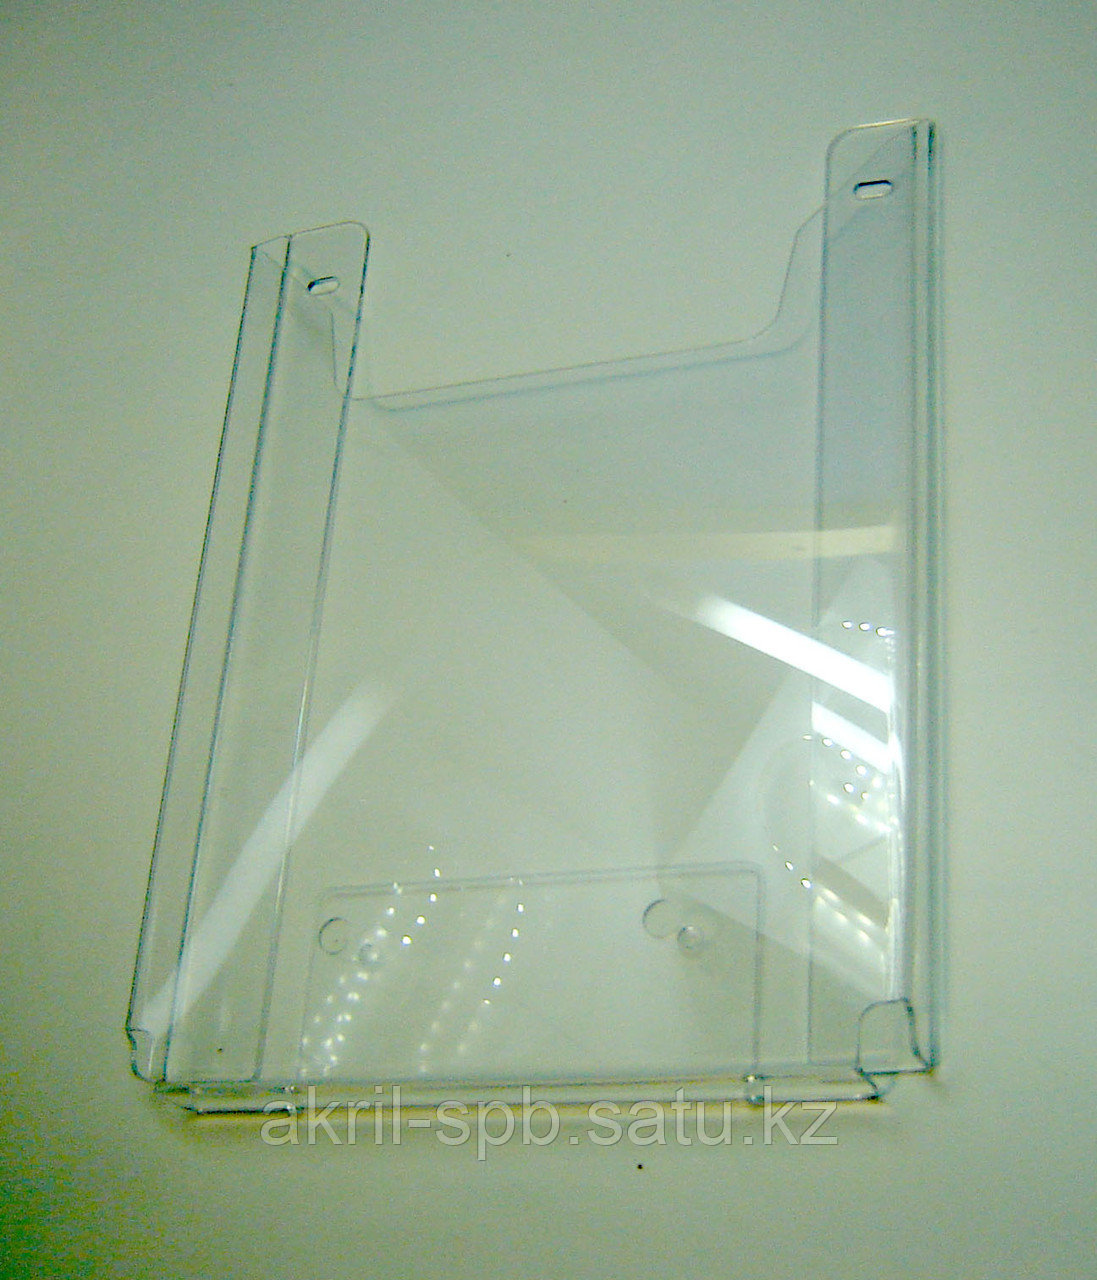 Карман буклетница А4 (акрил, на саморезы) верт 25